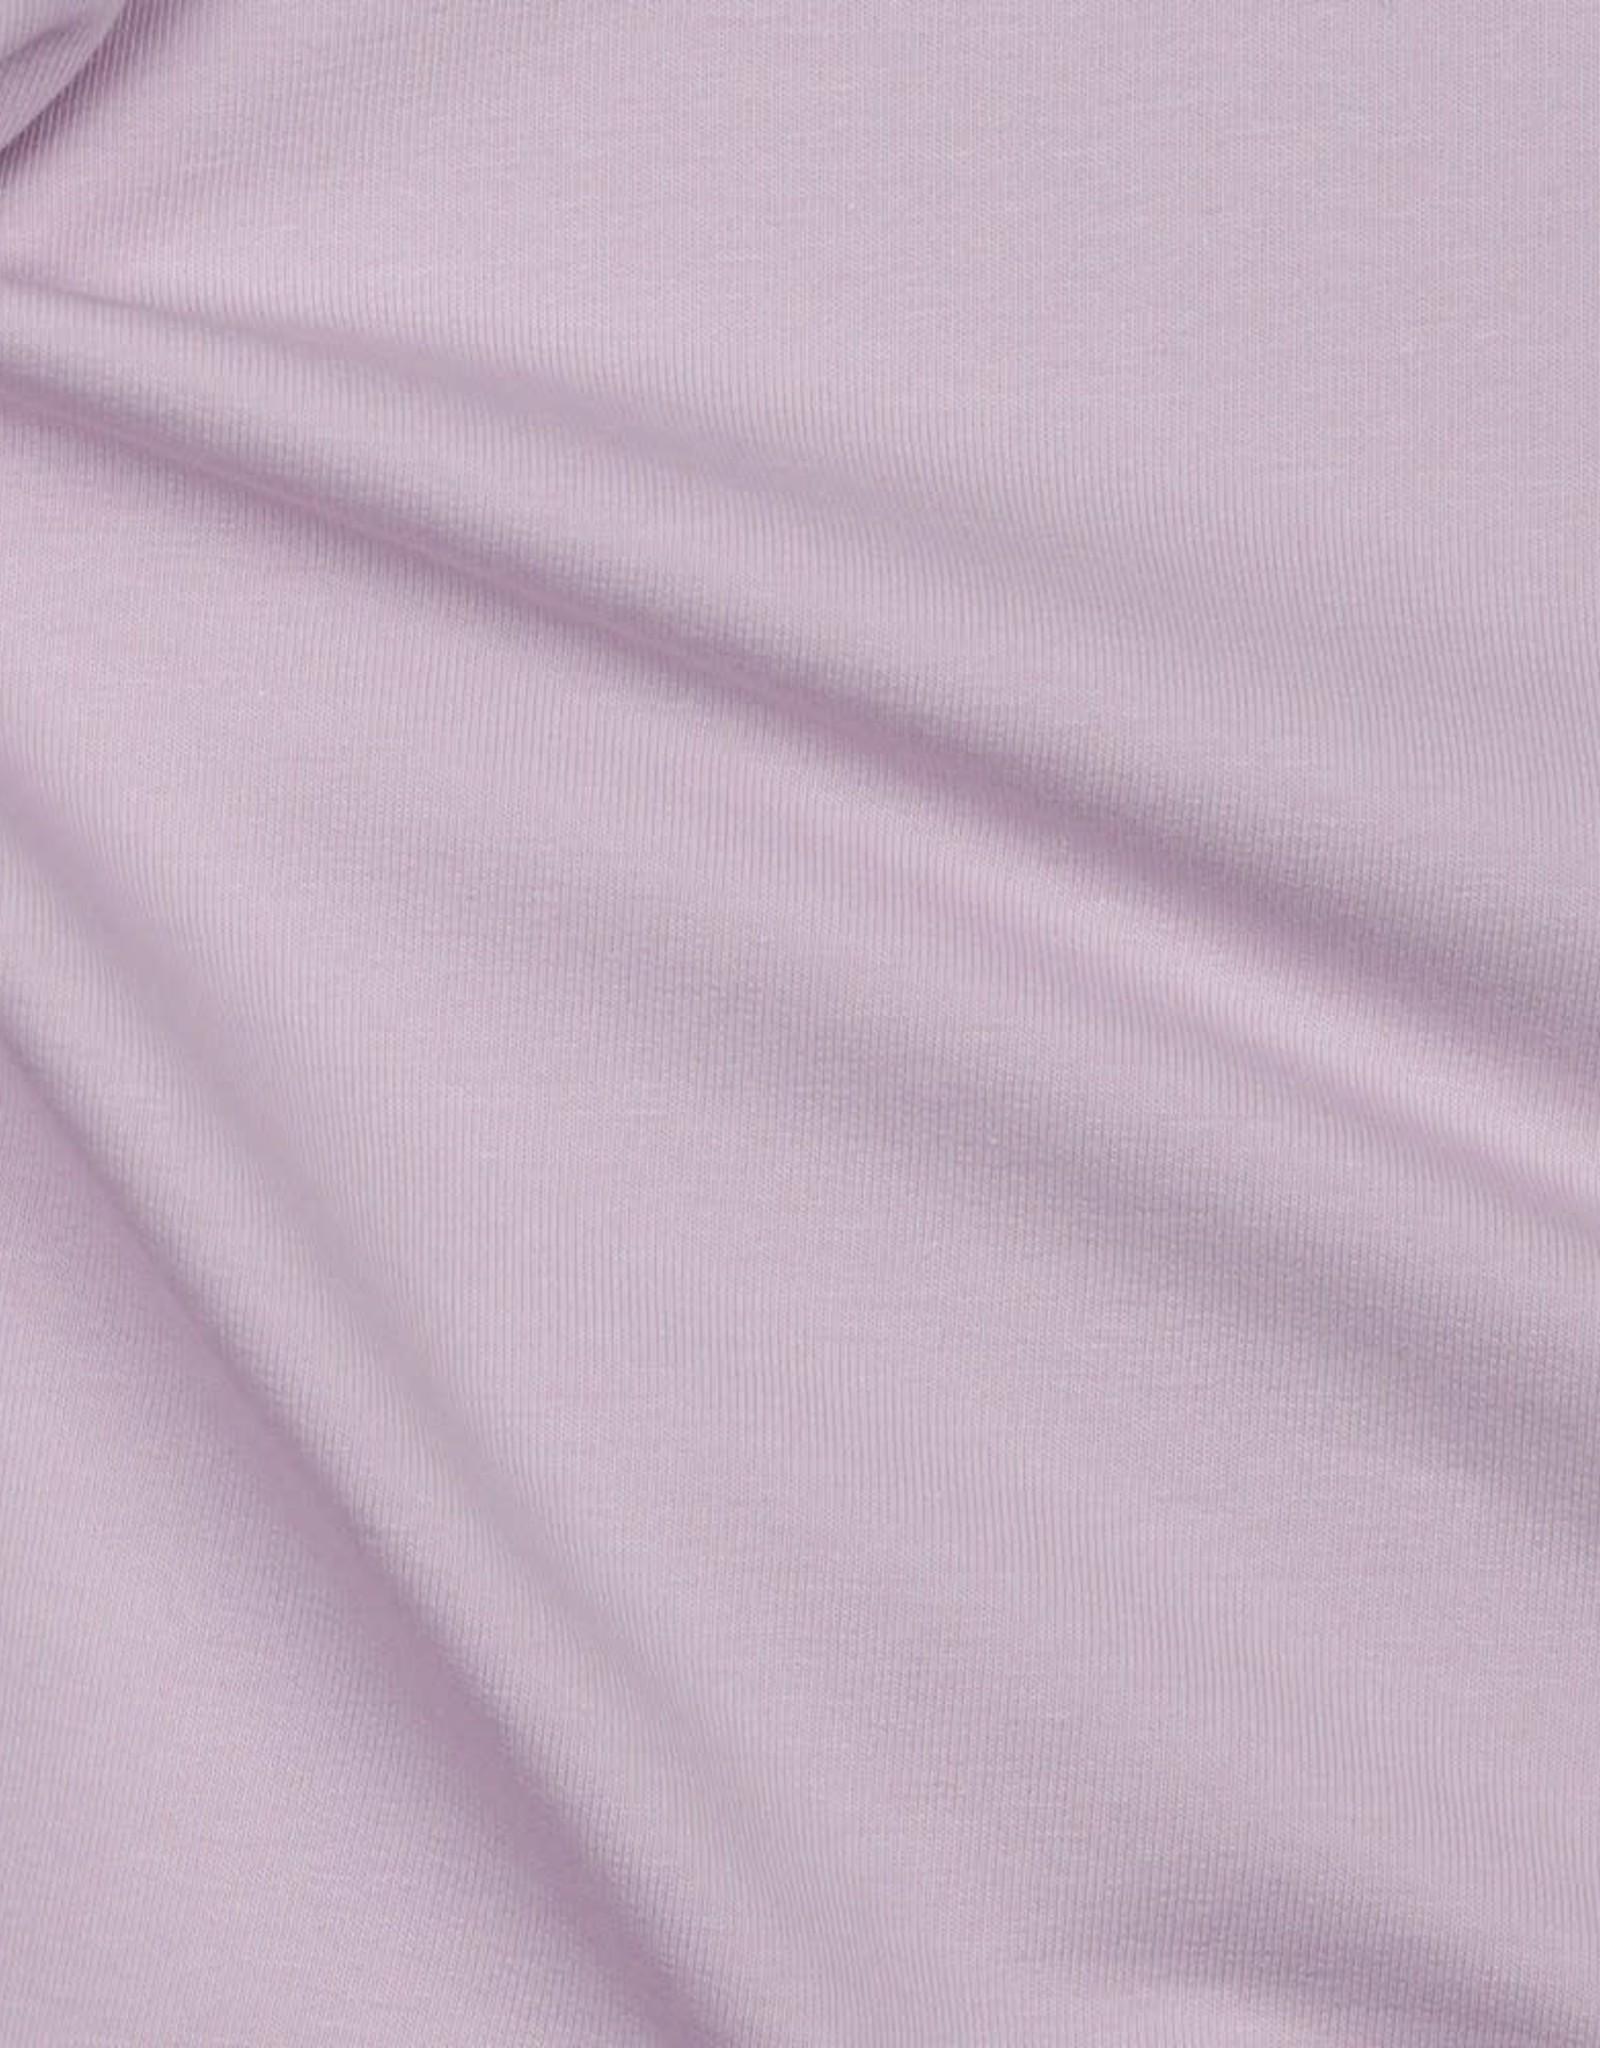 FT GOTS light lavender